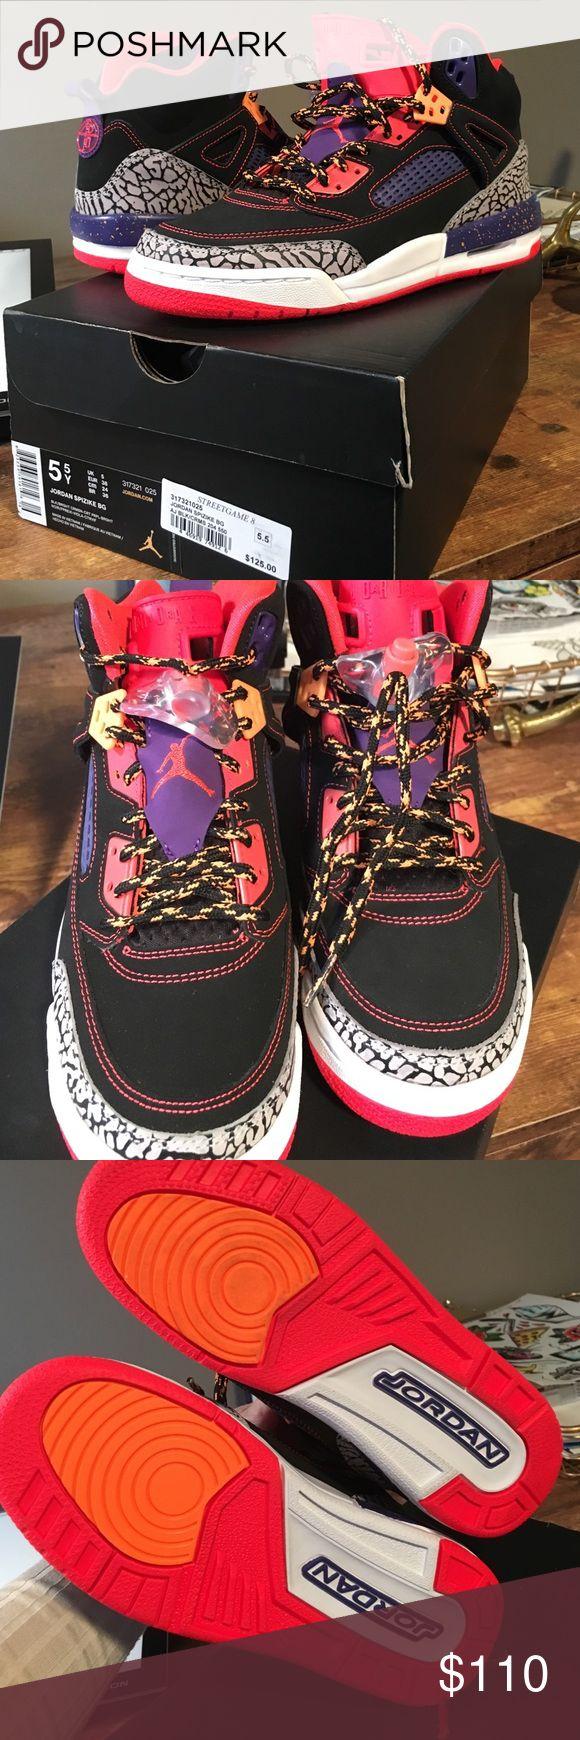 Jordan spizike high top sneakers New 🔥 Jordan high top sneakers - have never been worn. Black, purple, orange, grey, white. Size 5.5 in kids, 7 in women's. Jordan Shoes Sneakers